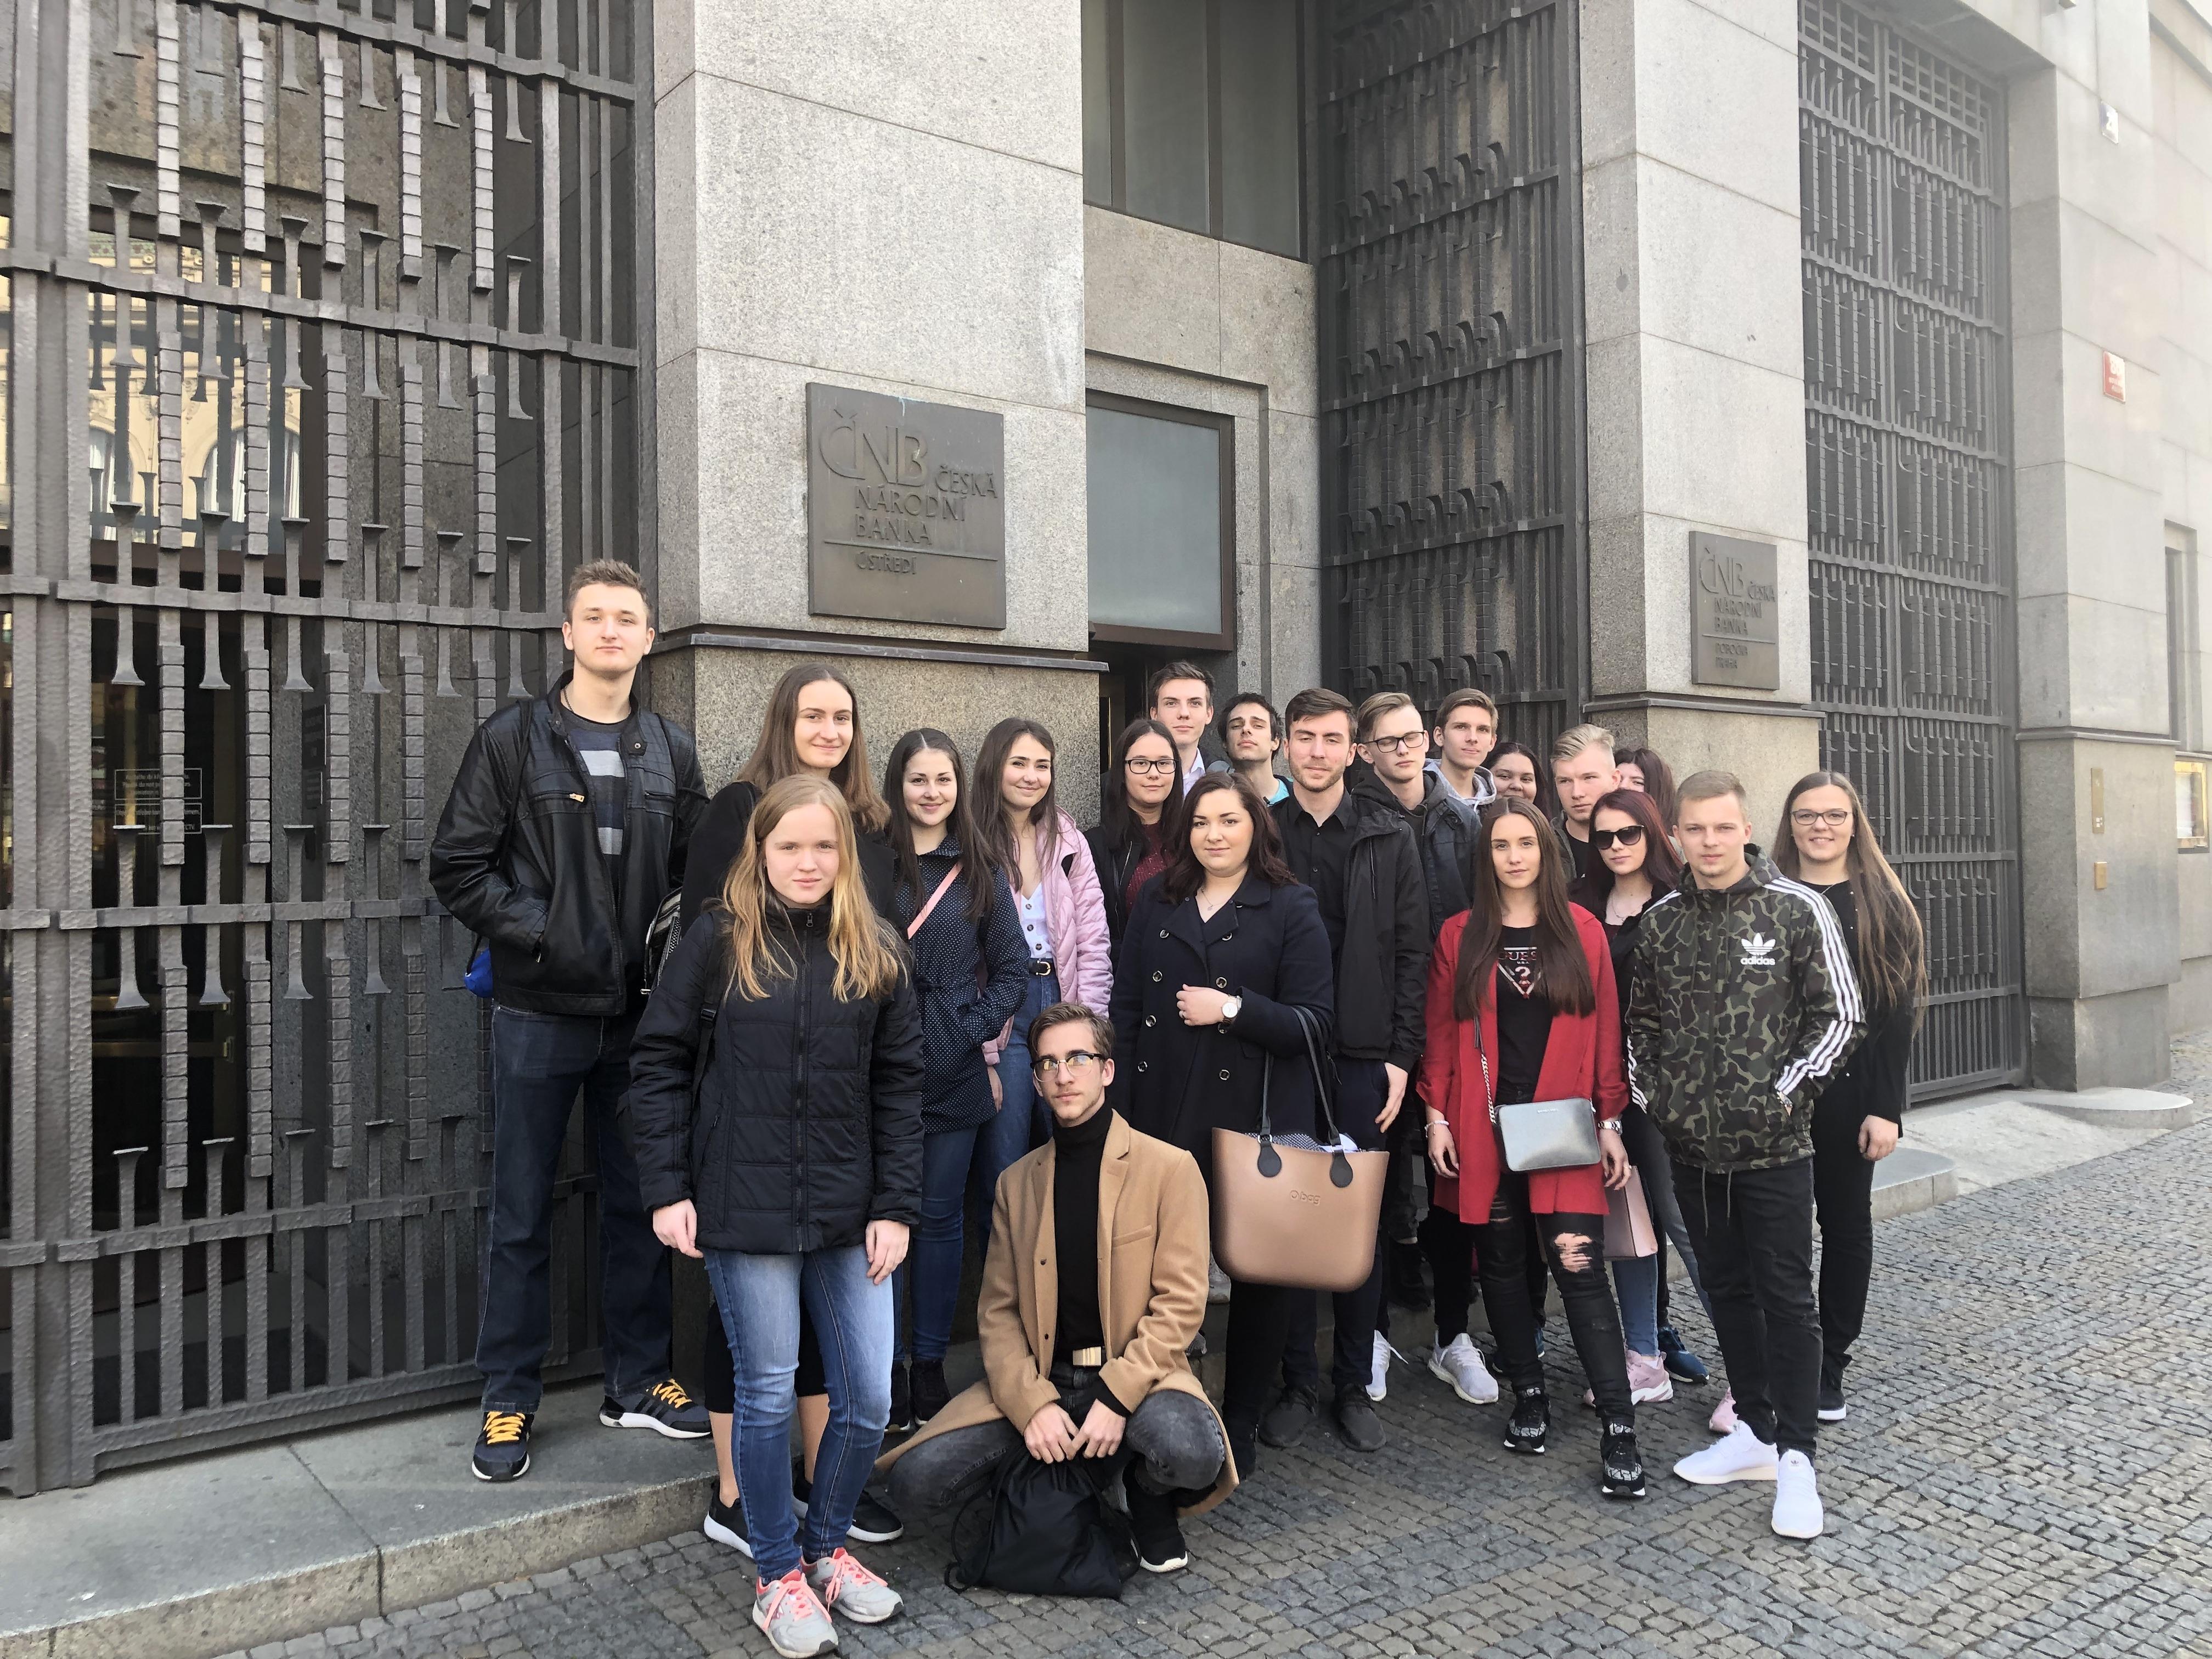 Exkurze mladých ekonomů do ČNB